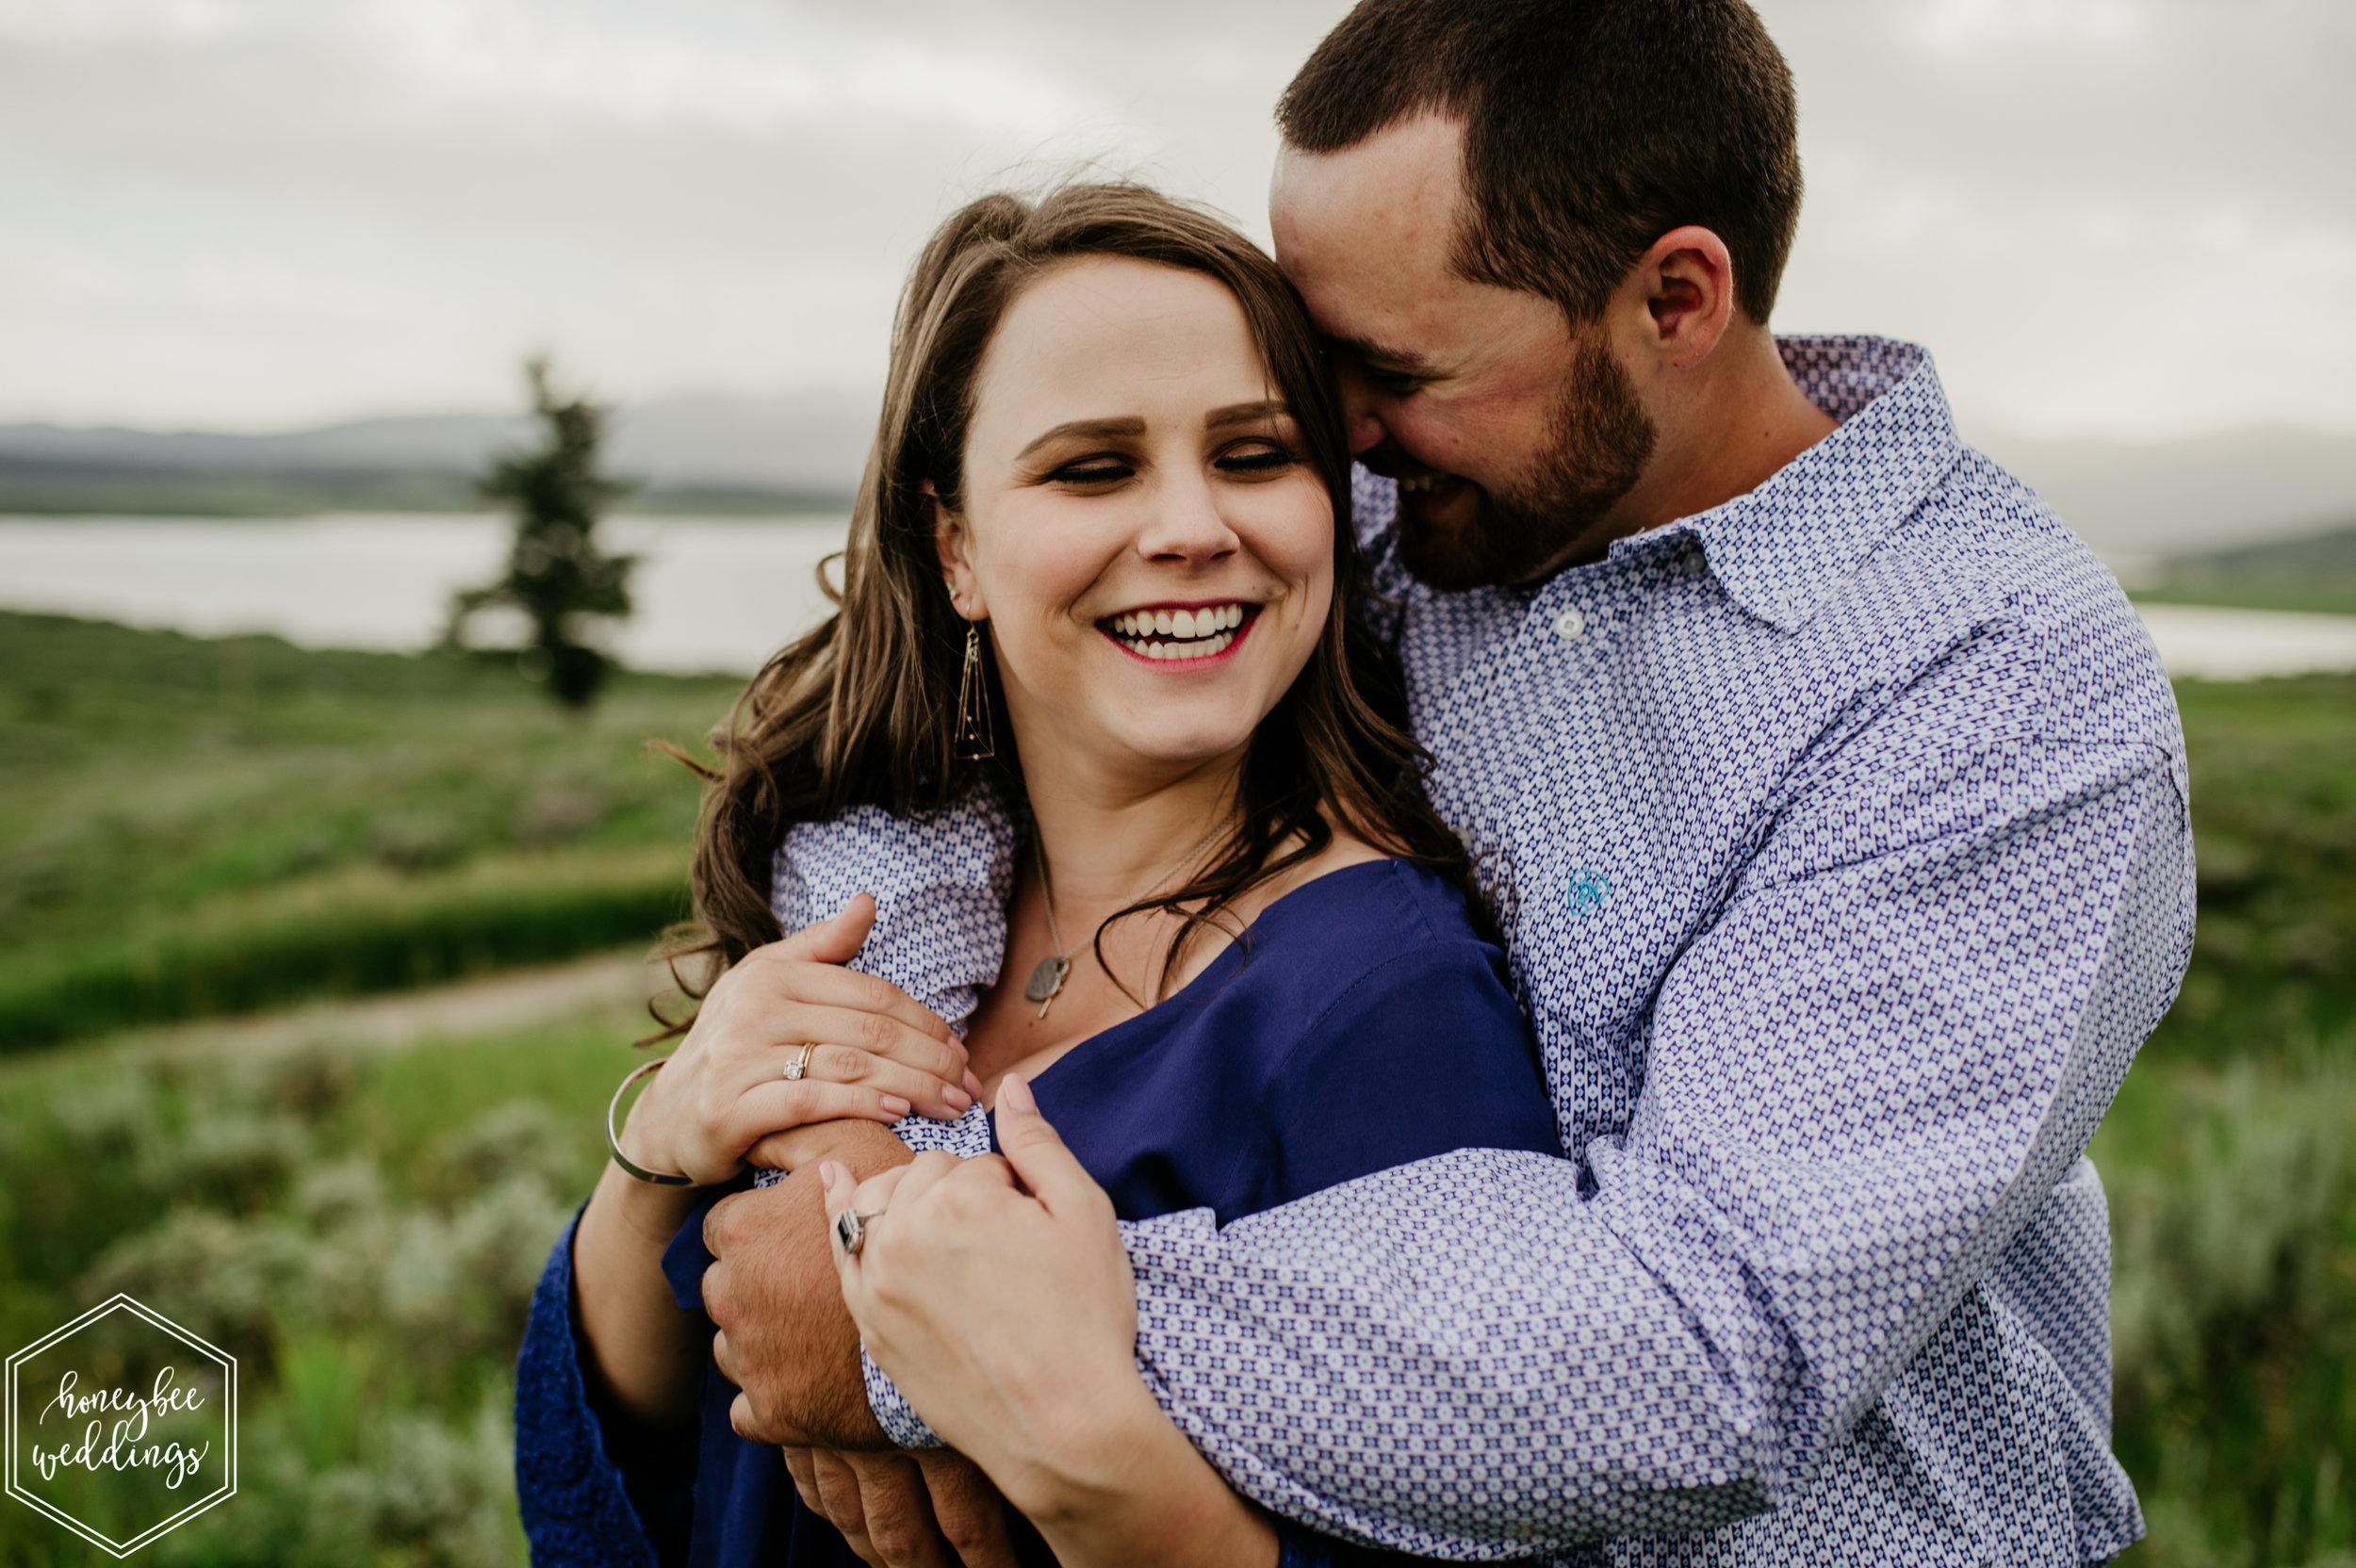 016Yellowstone National Park Wedding Photographer_Montana Engagement Session_Kelsie & DJ_July 24, 2019-261.jpg